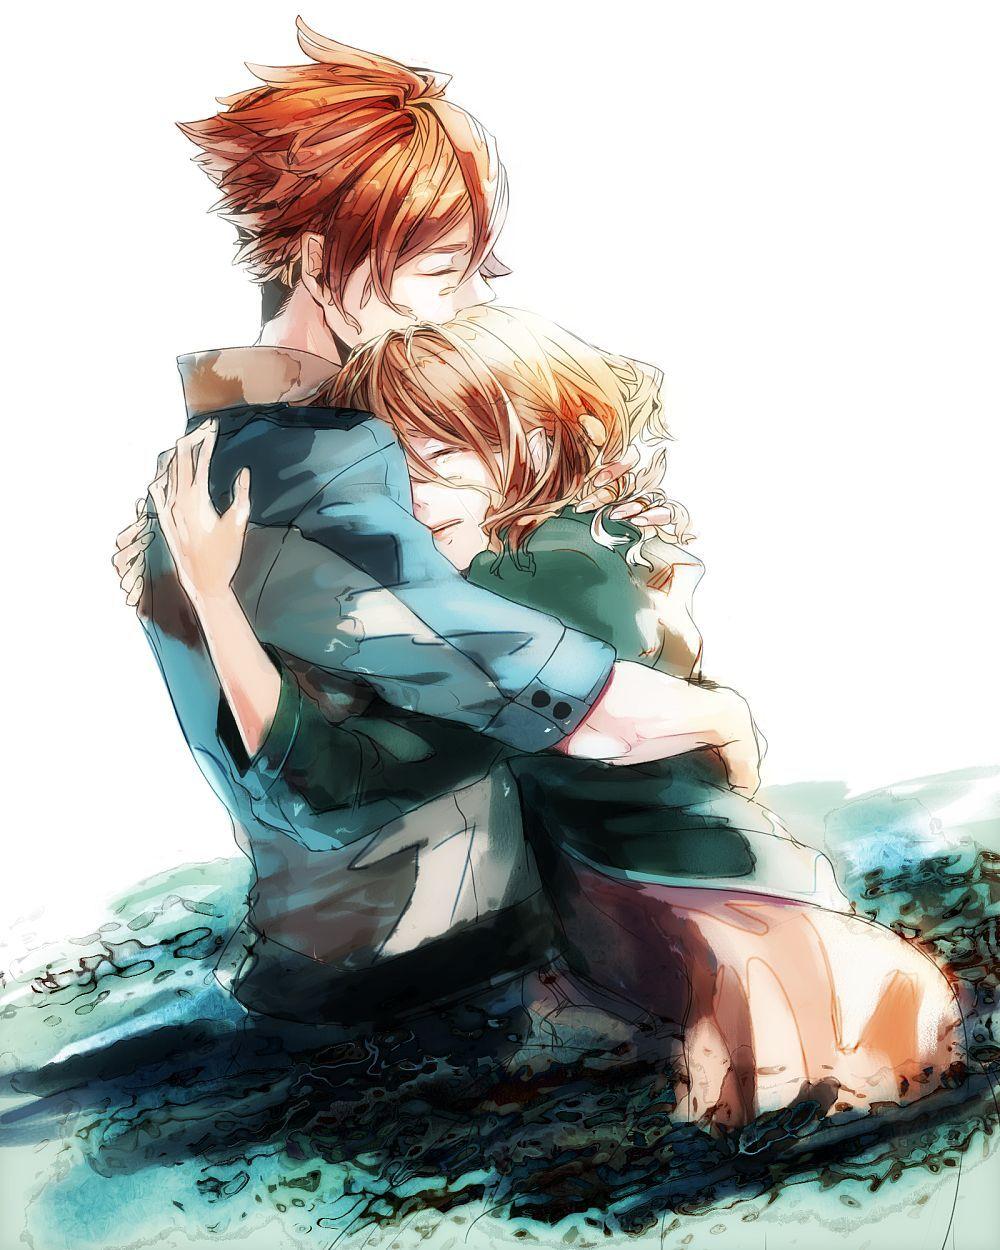 Anime Girl Hugging Boy : anime, hugging, Vivienne, Pretty, Anime, Style, Anime,, Couple